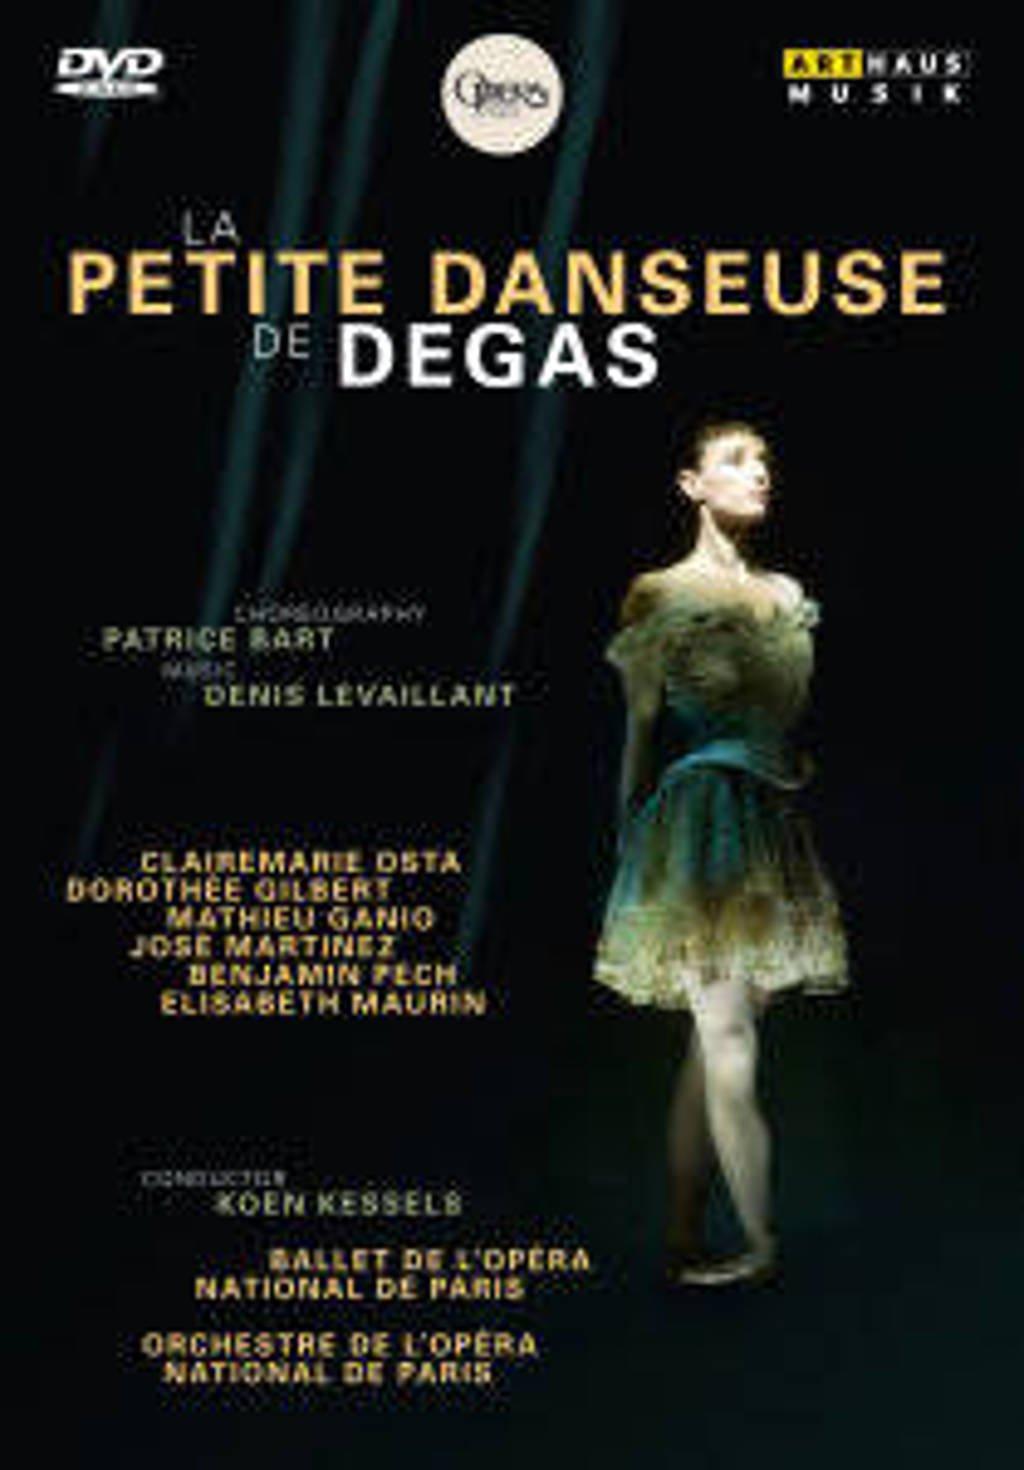 Original Soundtracka,Gilbert, Ganio, Martinez,Pech - La Petite Danseuse De Degas 2010 (DVD)